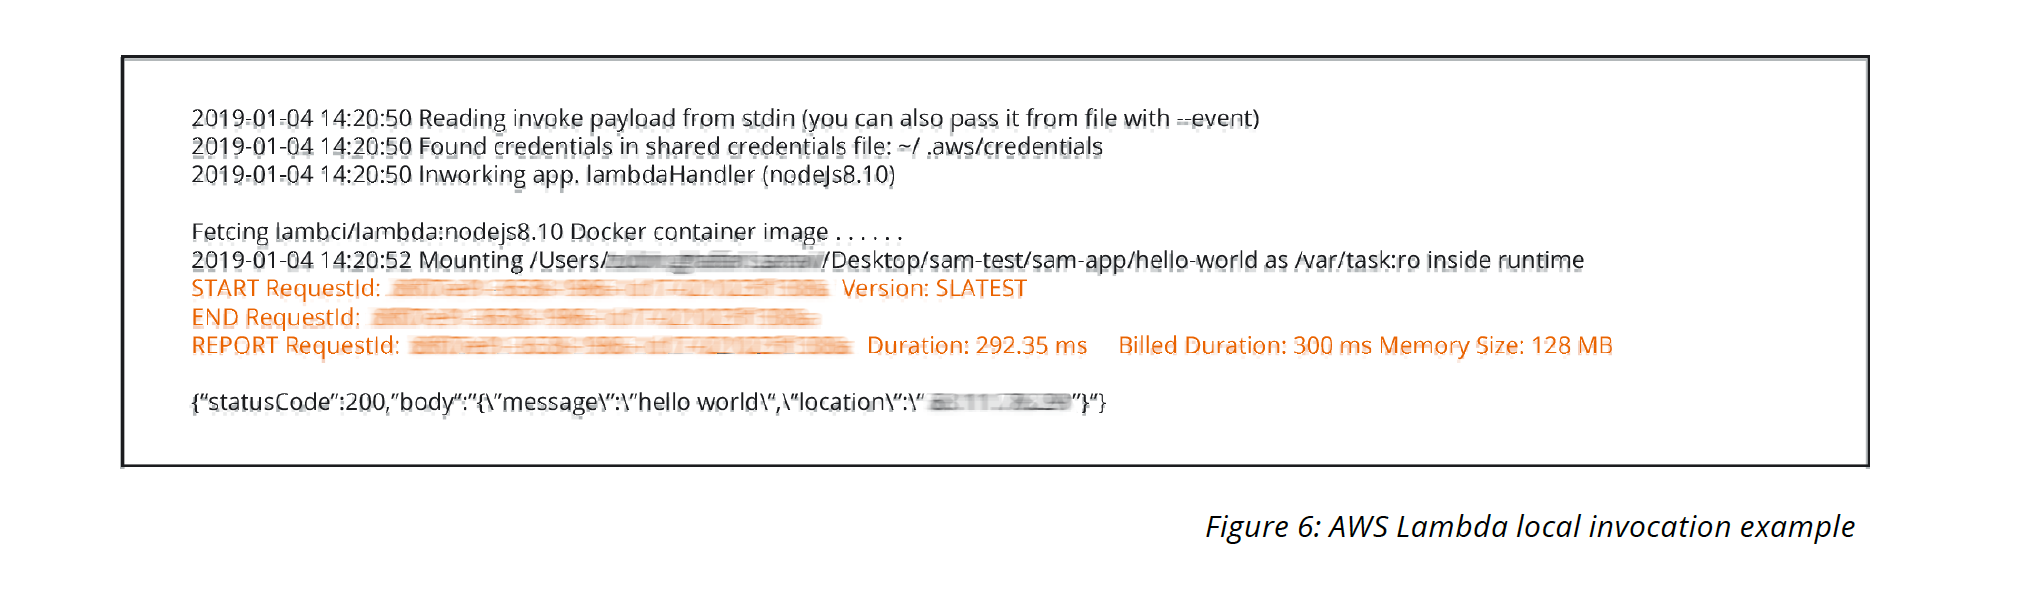 exam-web-platform-6